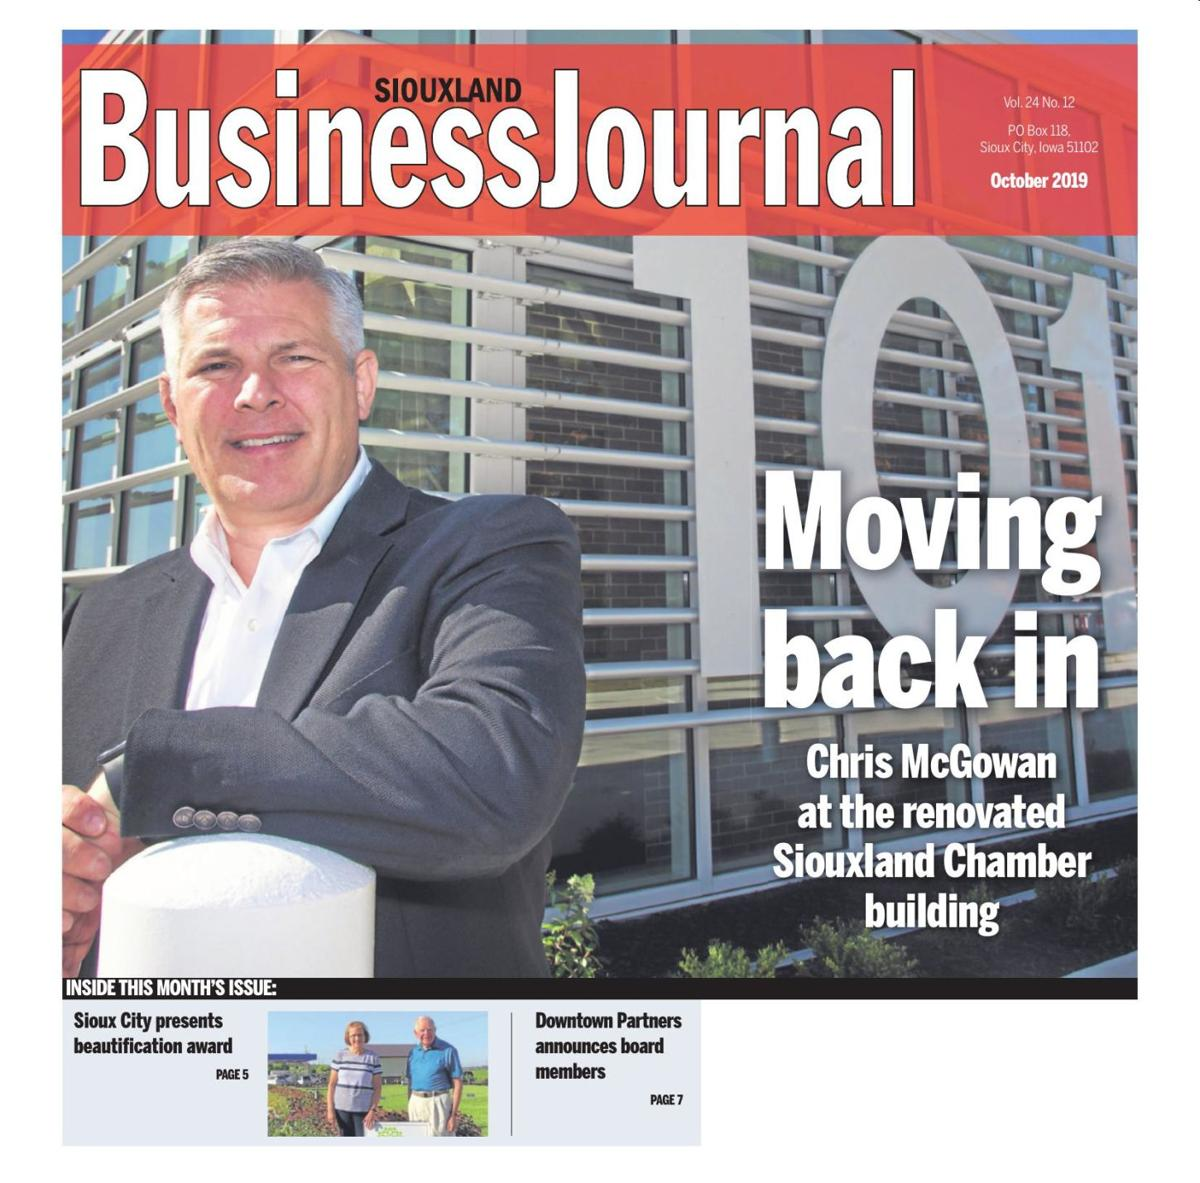 Business Journal - October 2019